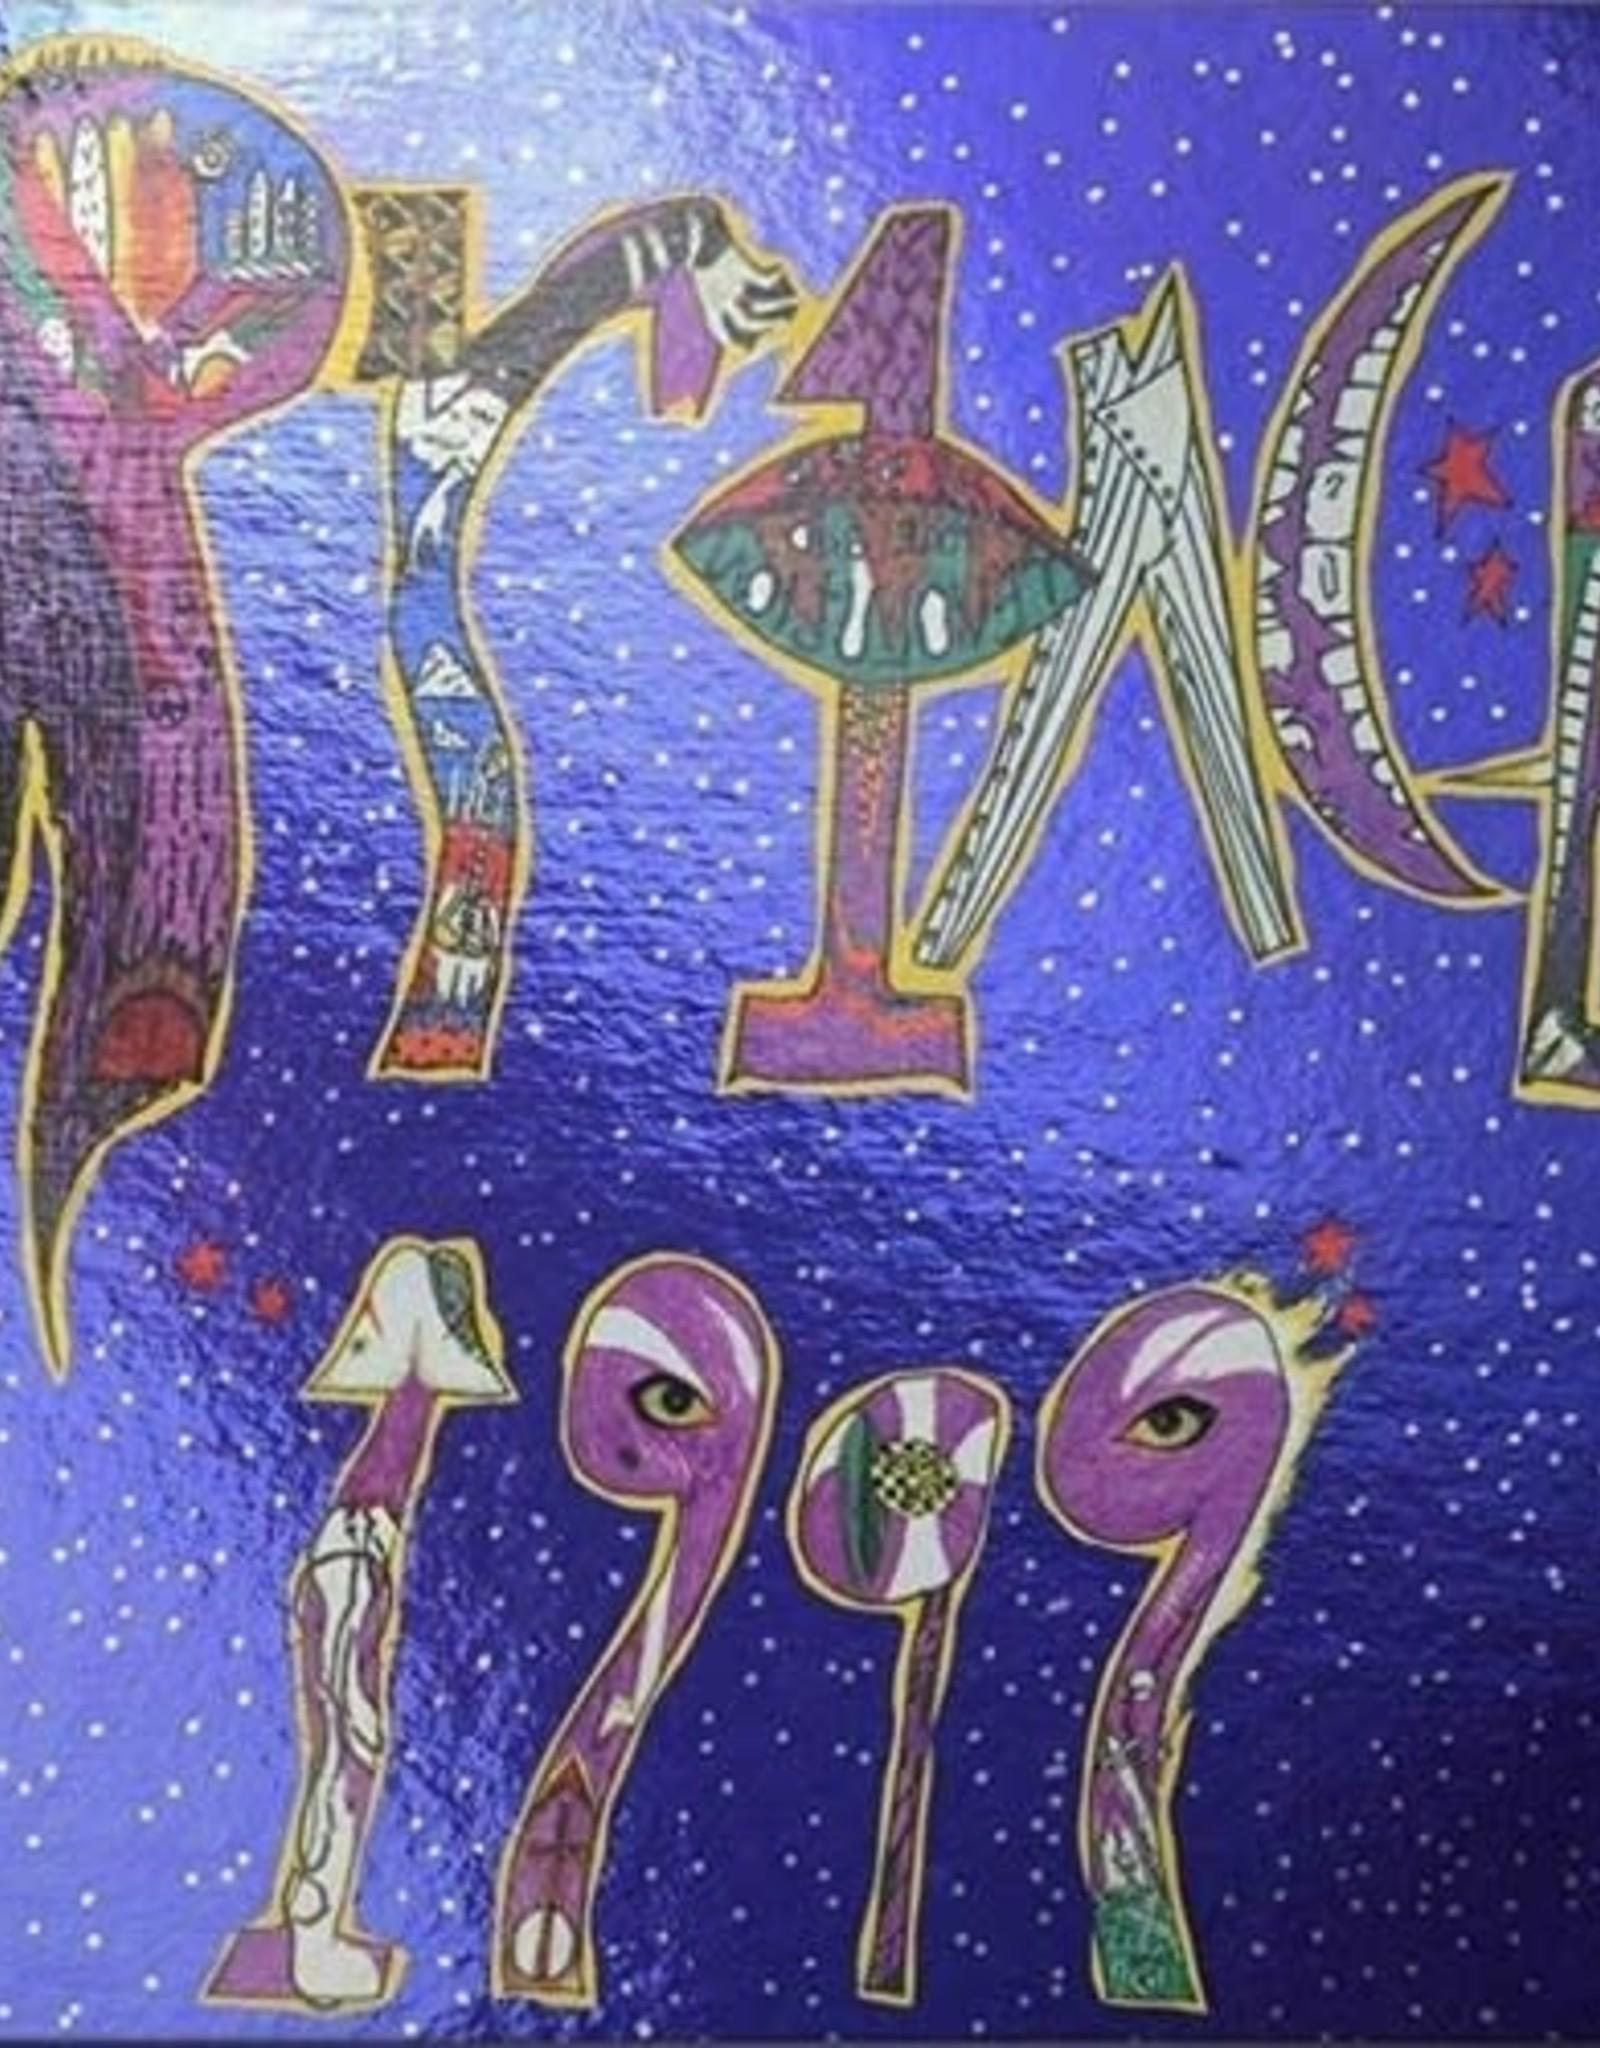 Prince - 1999 (Remastered) (2Lp)